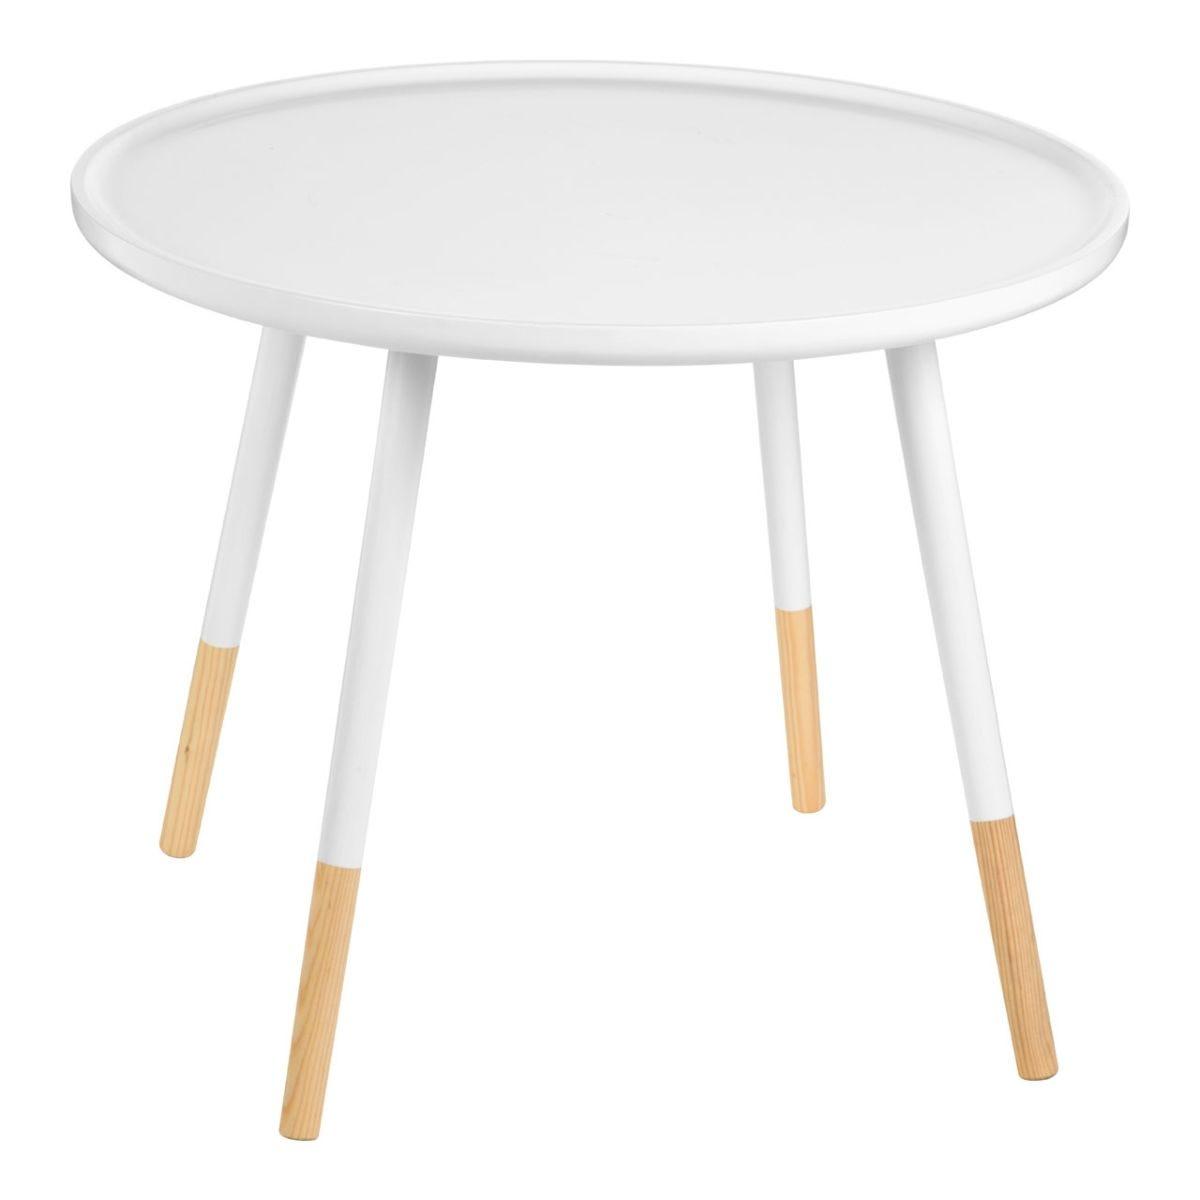 Viborg Large Round Side MDF Table - White